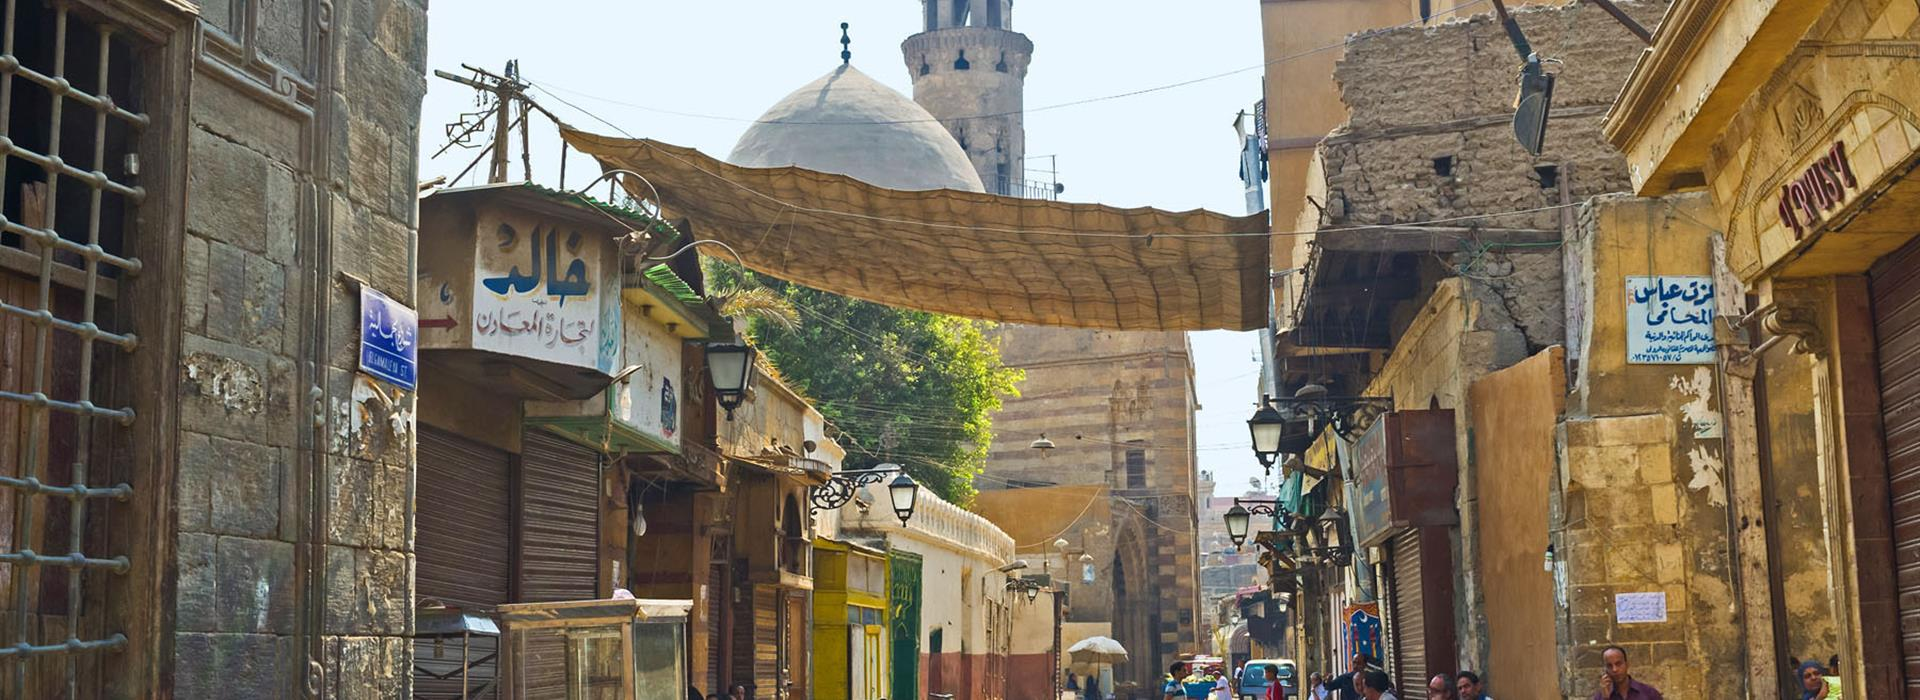 egypt-cairo_374680654